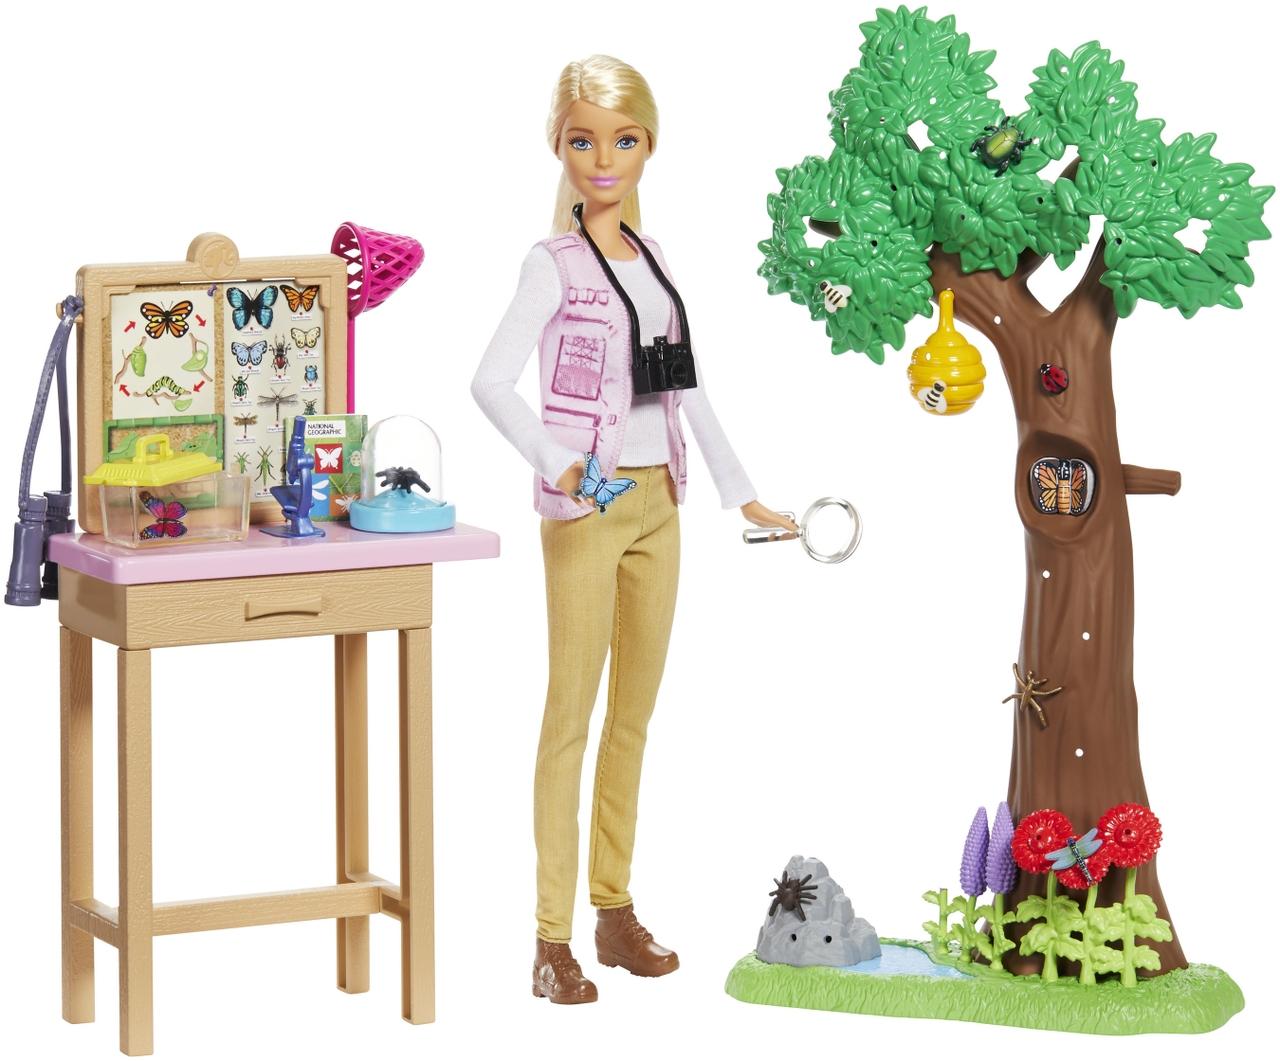 A Barbie playset